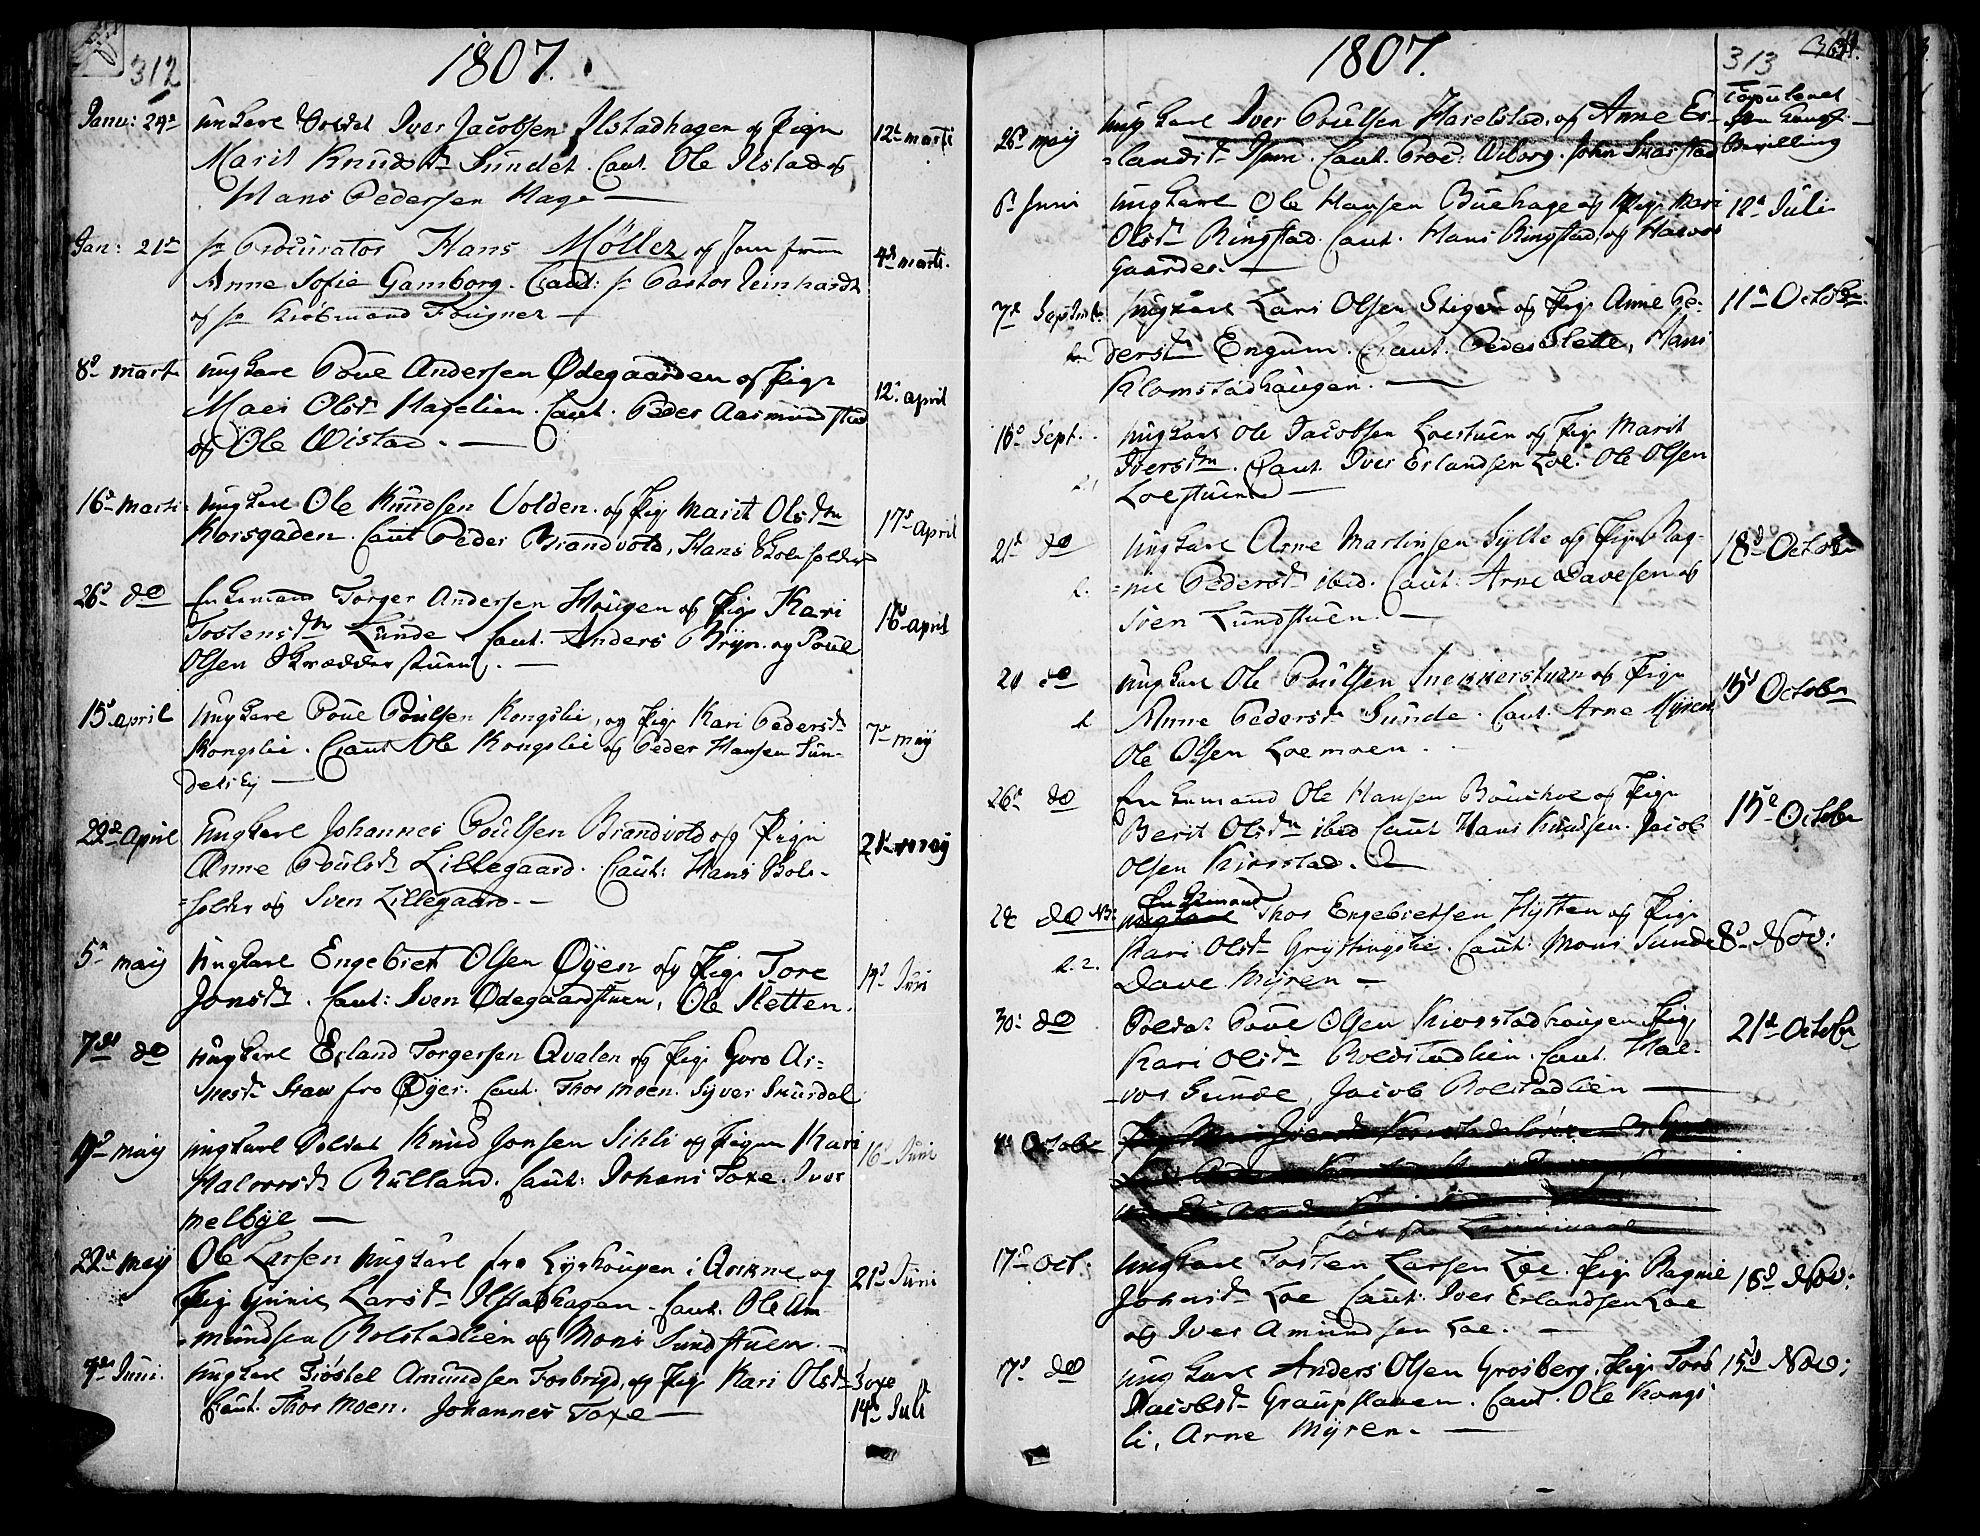 SAH, Fron prestekontor, H/Ha/Haa/L0001: Ministerialbok nr. 1, 1799-1816, s. 312-313